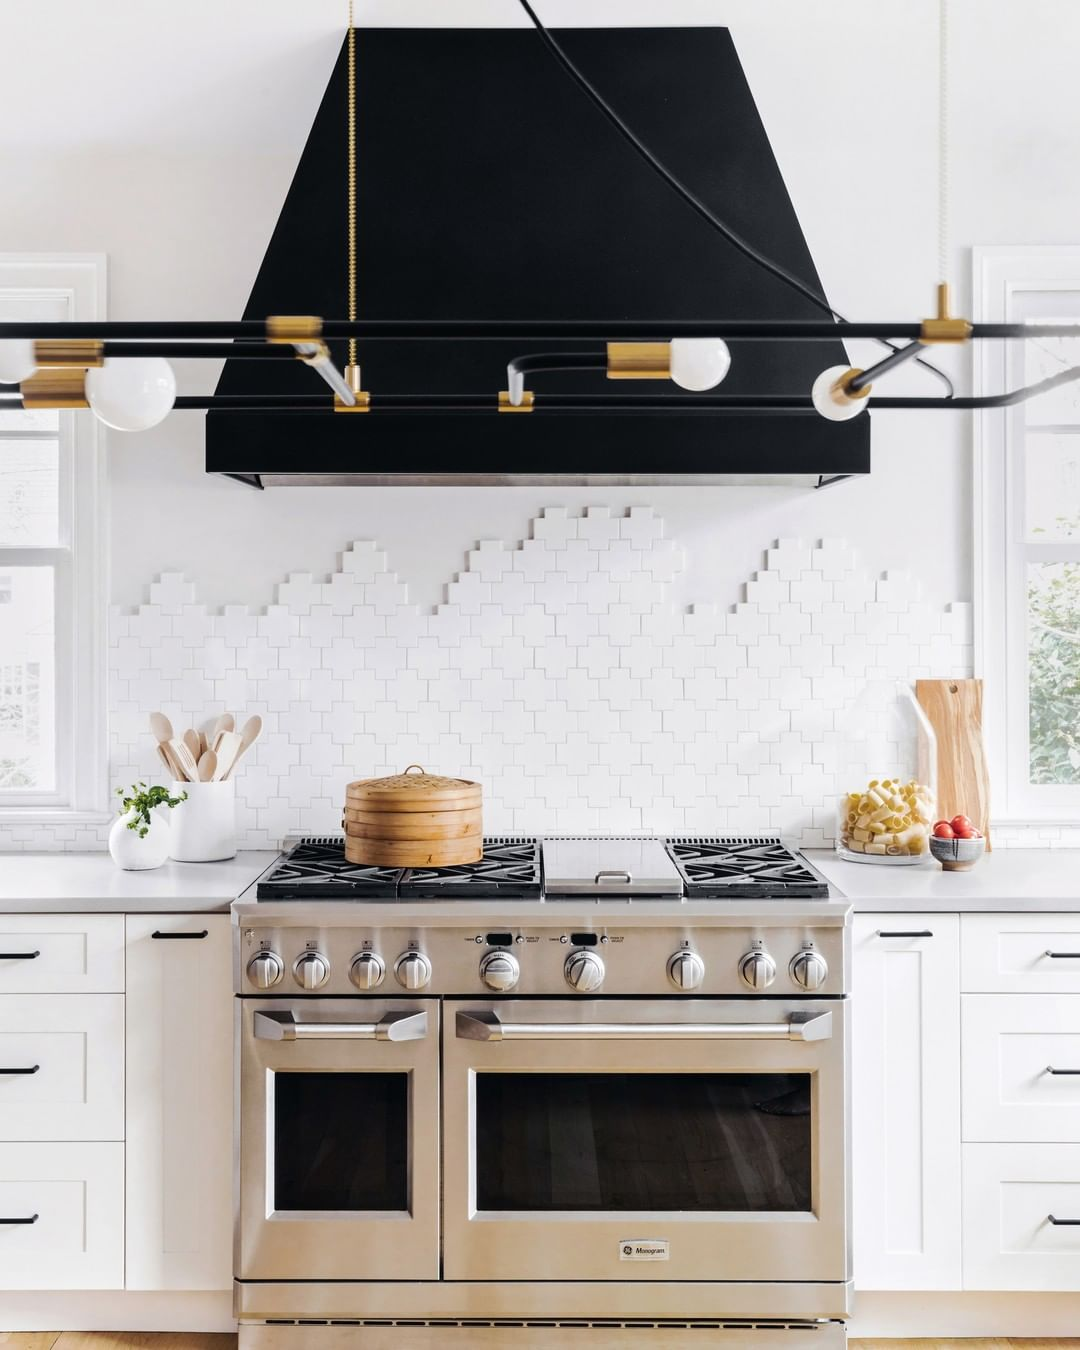 Lonny On Instagram The Definition Of Backsplash Goals Design By Kerramichele Photography By Kitchen Range Hood Stylish Kitchen Black Range Hood